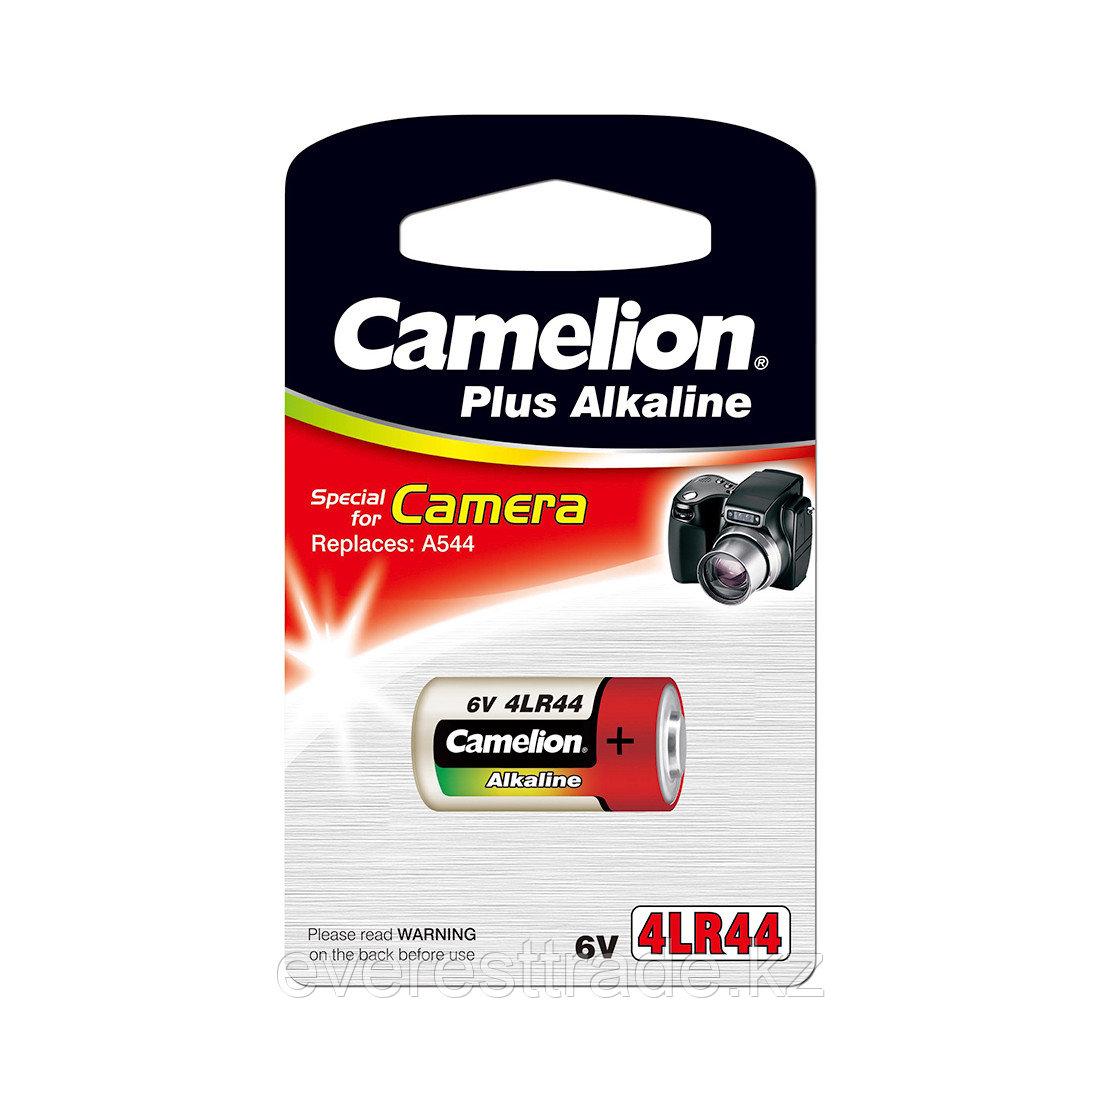 Camelion Батарейка, CAMELION, 4LR44-BP1C, Photo Plus Alkaline, 6V, 150 mAh, 1 шт., Блистер